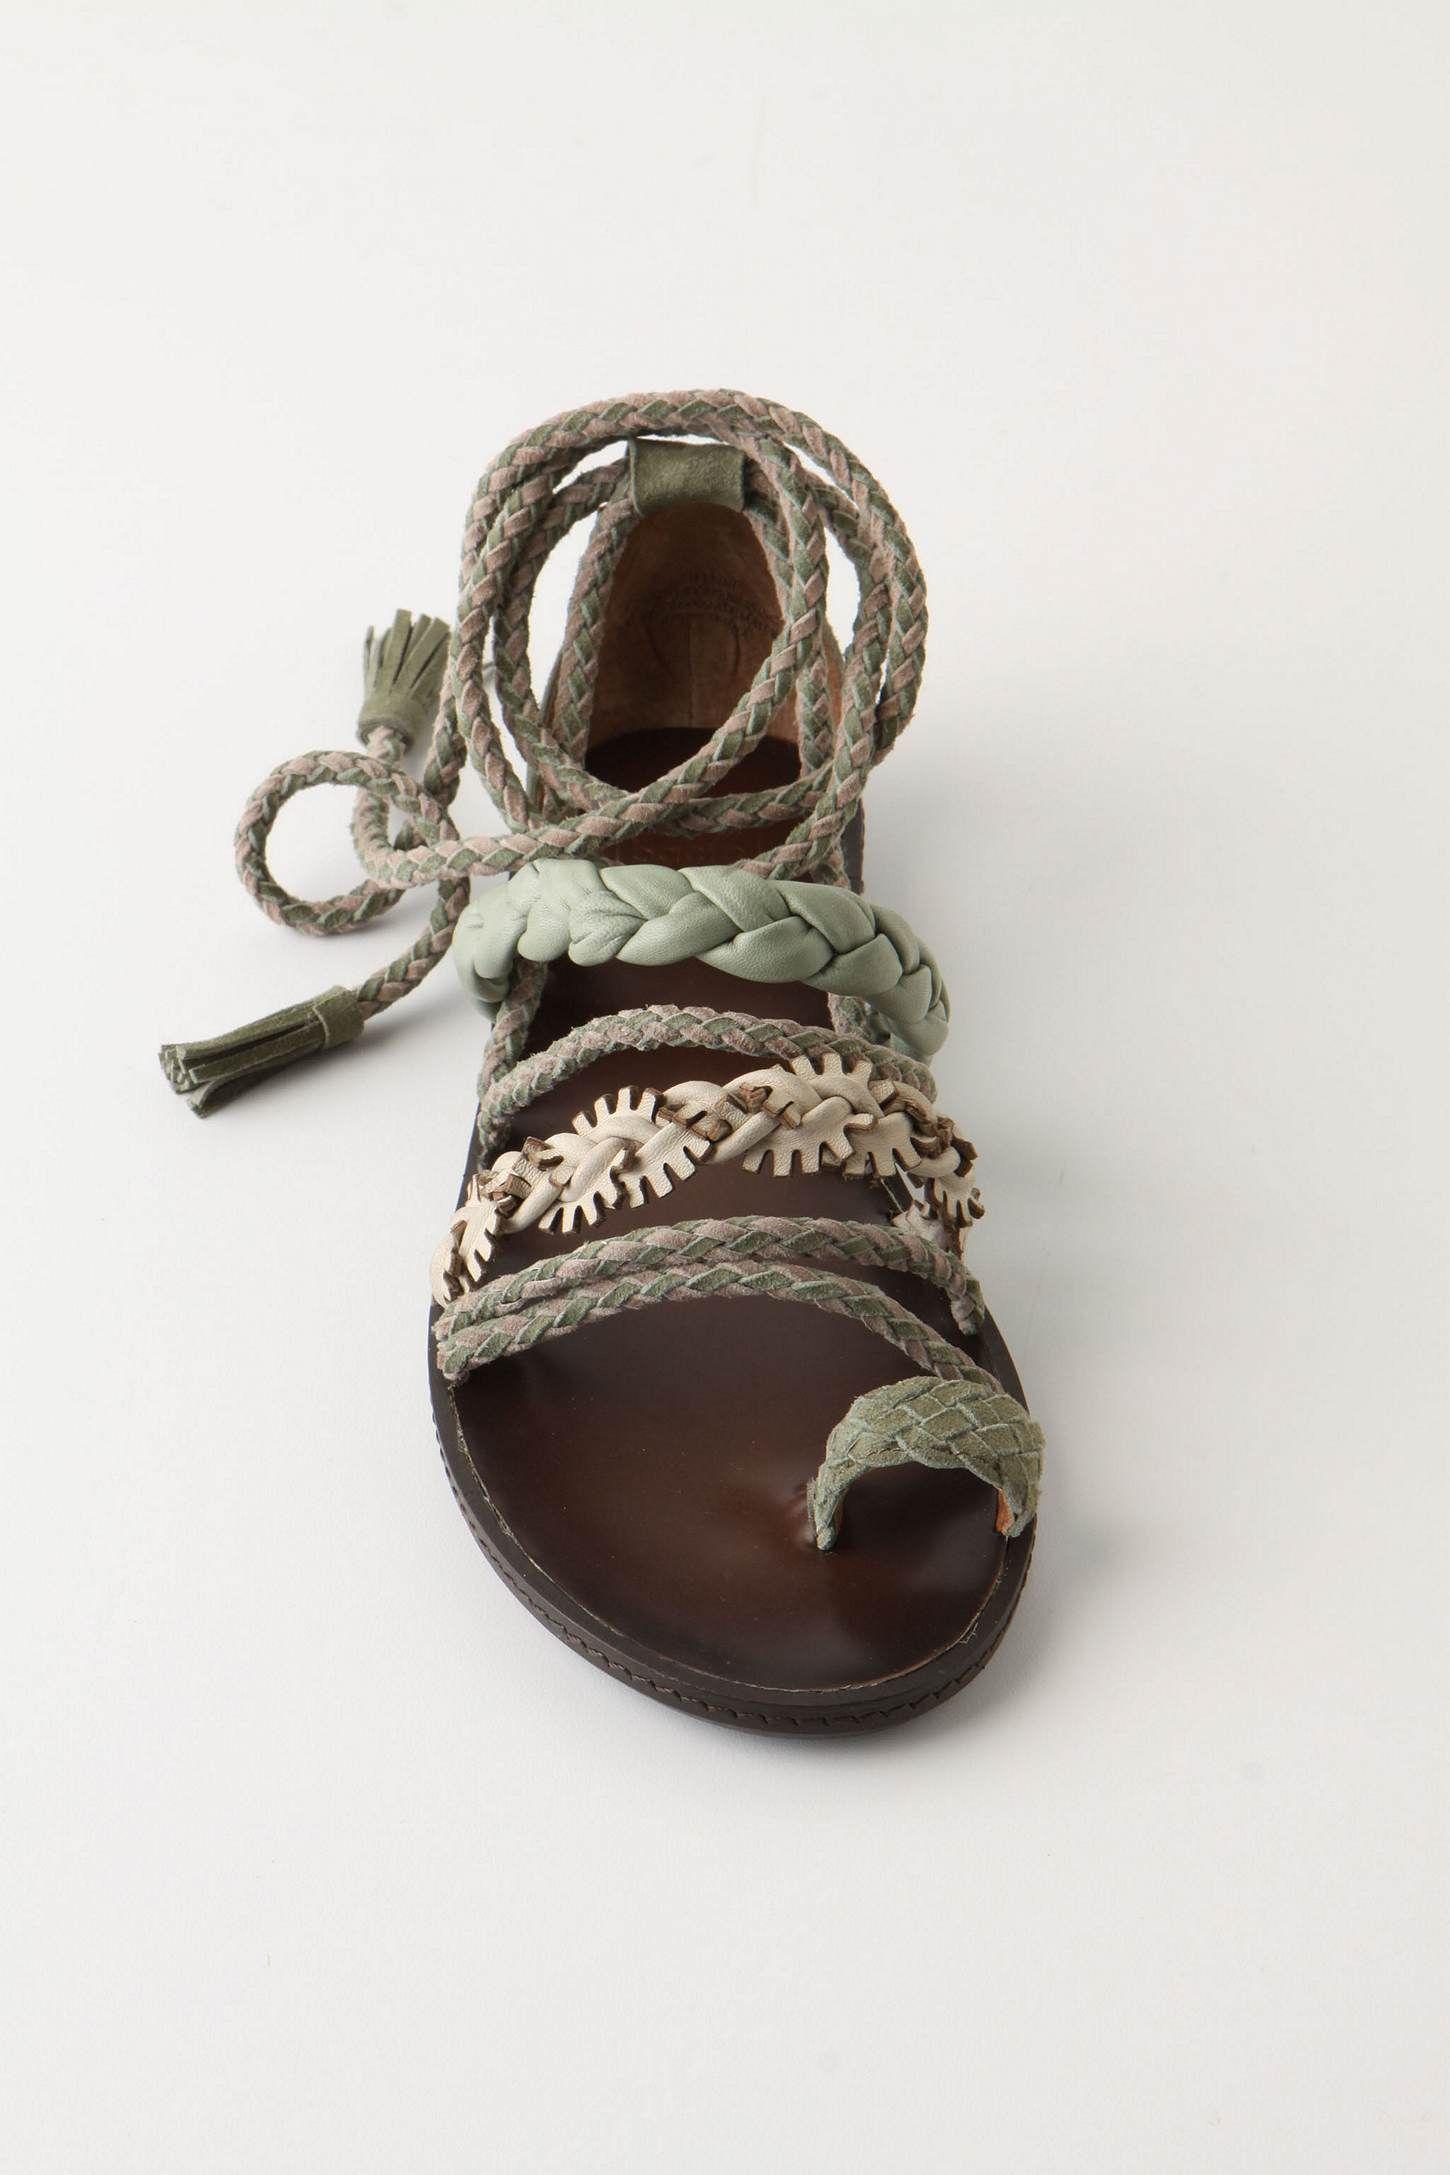 Finch ZapatosSandalias SandalsShoes Finch SandalsShoes Hippie Finch Weaver Hippie Weaver ZapatosSandalias Weaver PXkiuZ